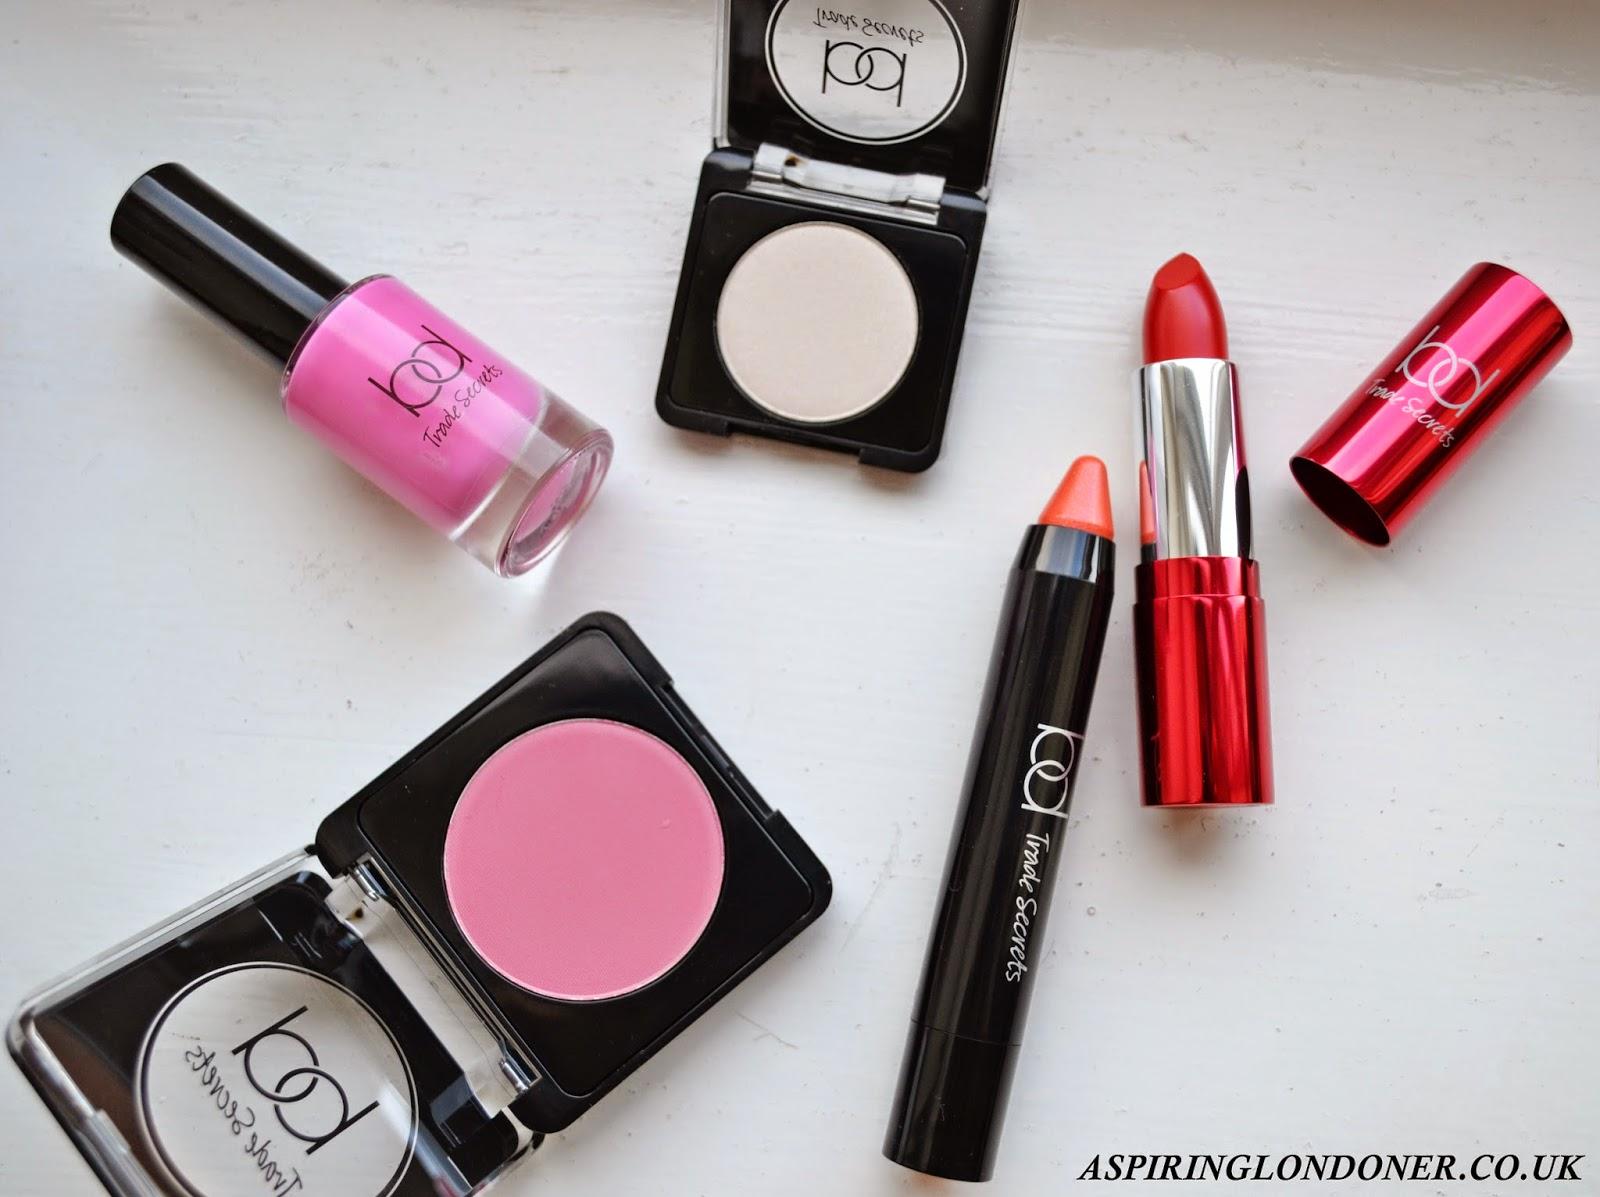 Tesco BD Trade Secrets Makeup Collection - Aspiring Londoner